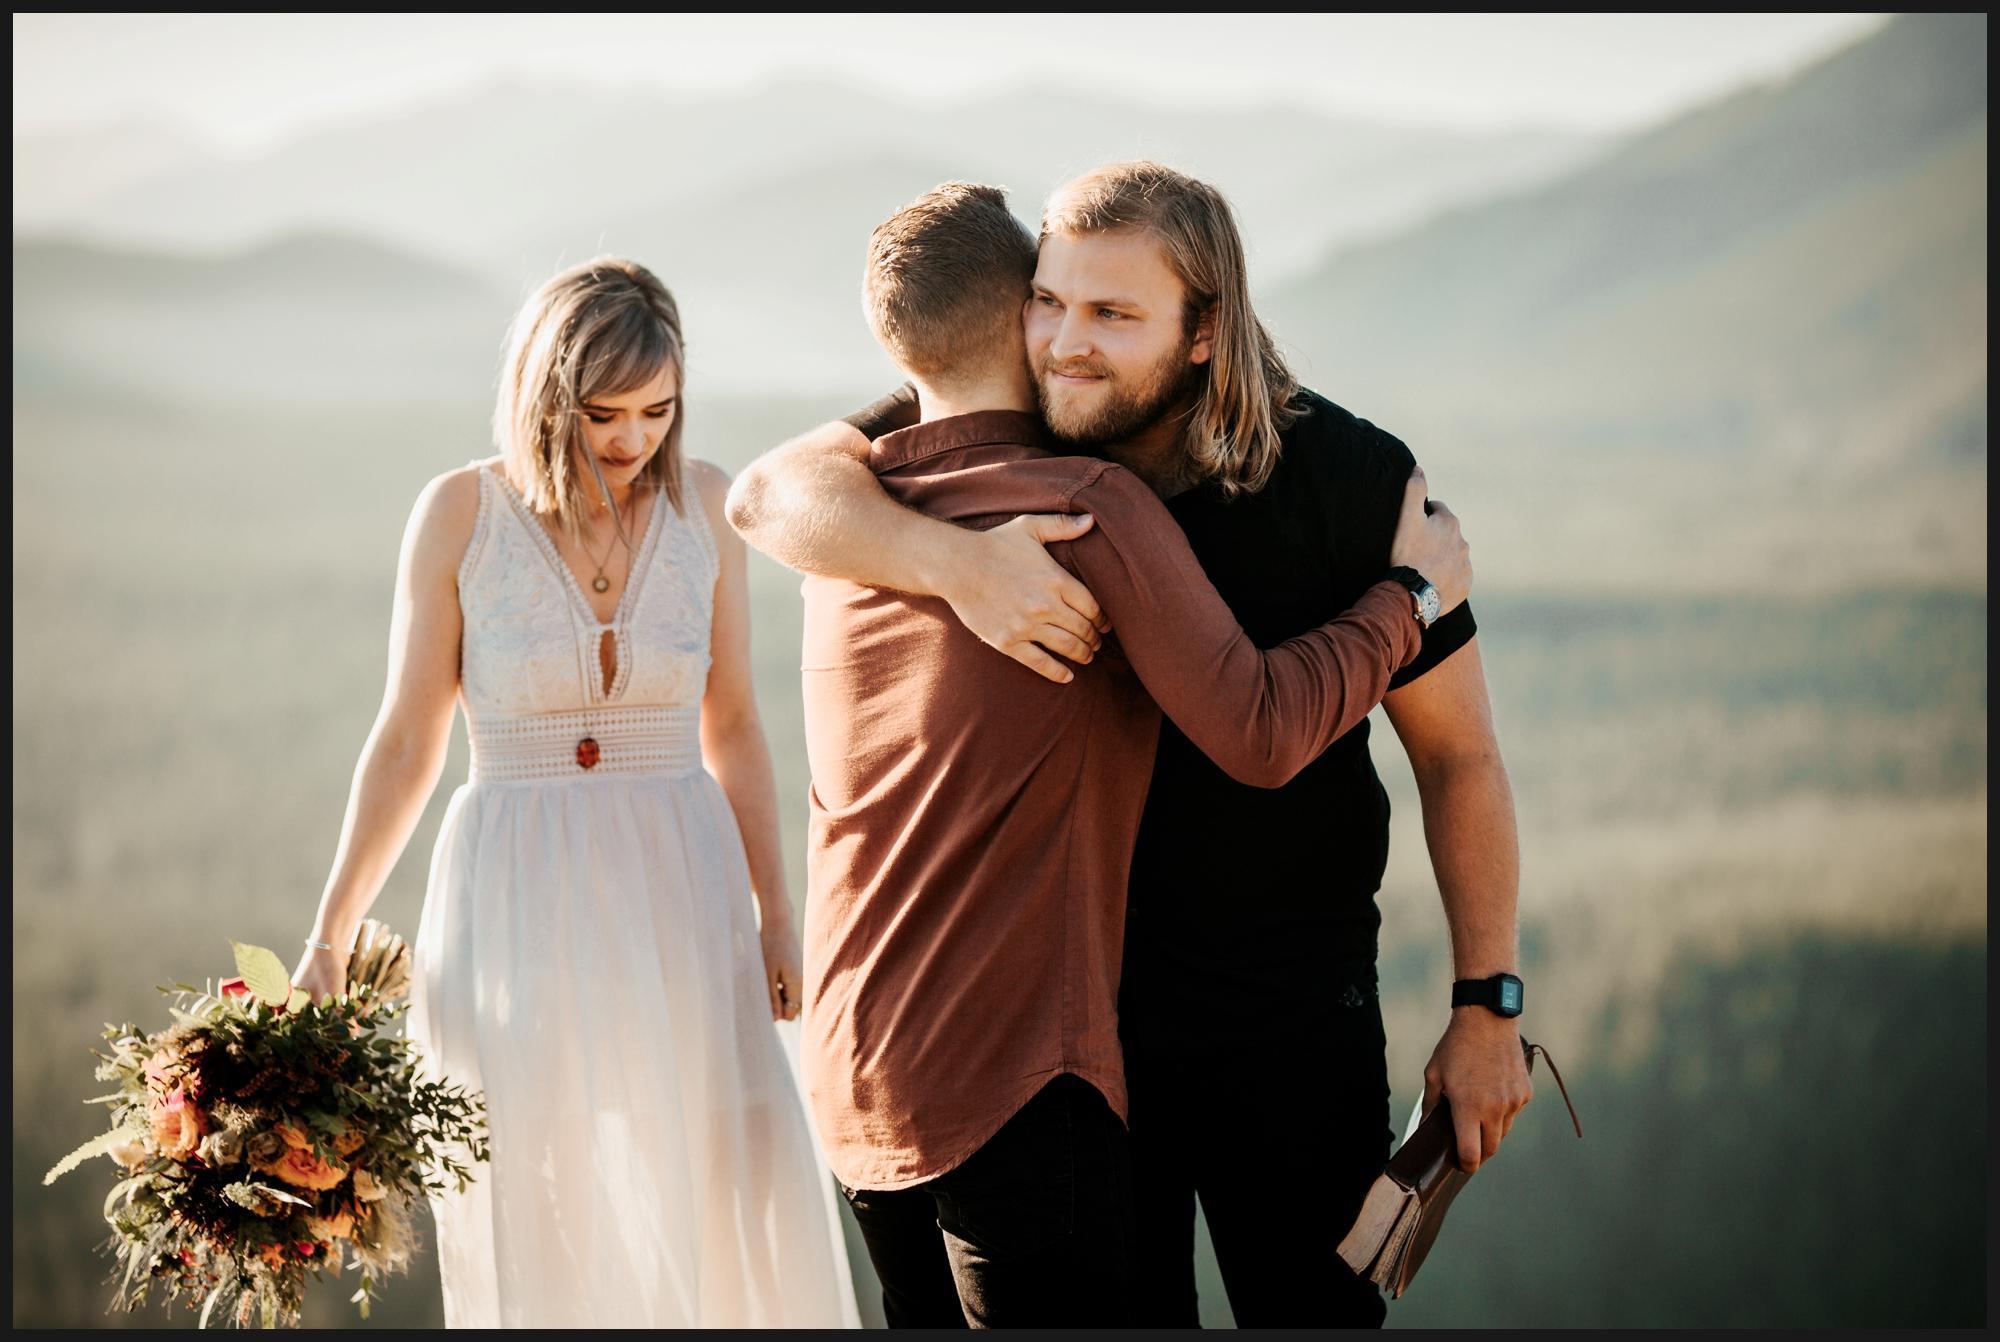 Orlando-Wedding-Photographer-destination-wedding-photographer-florida-wedding-photographer-bohemian-wedding-photographer_0457.jpg